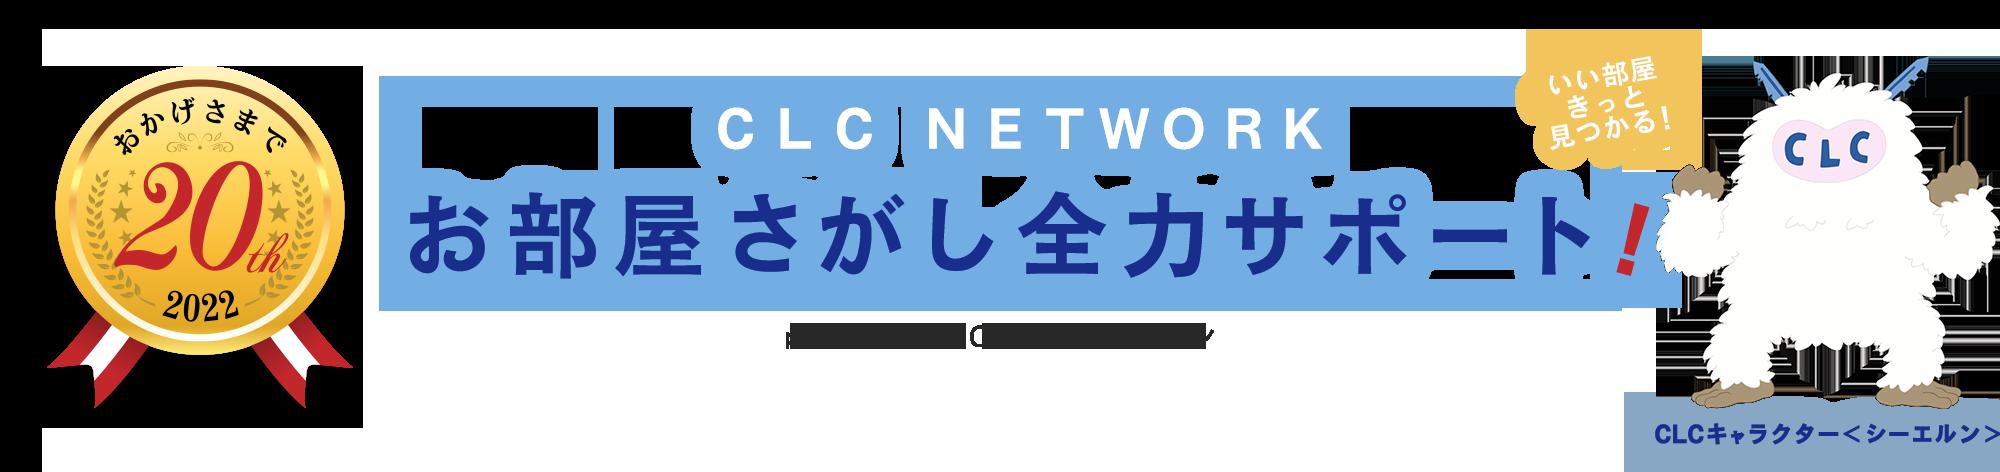 CLC NETWORK お部屋さがし全力サポート! powered by CLCコーポレーション